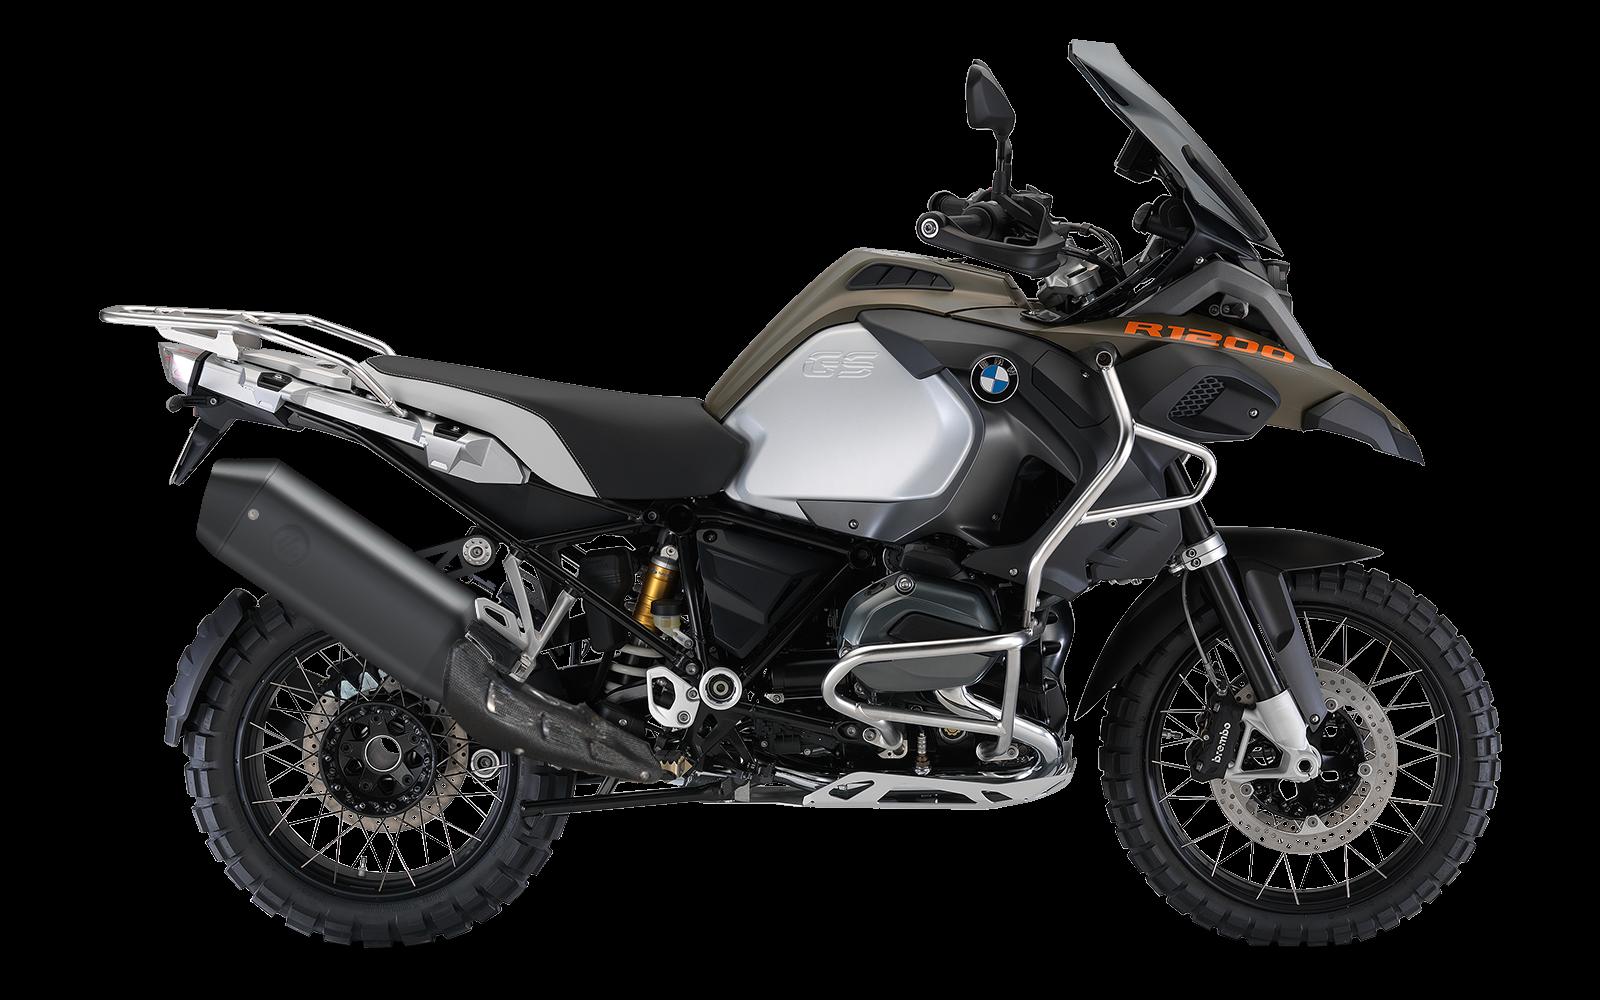 Adventure - R1200GS ADV - 1200 LC - 2014-2016 - Endtöpfe